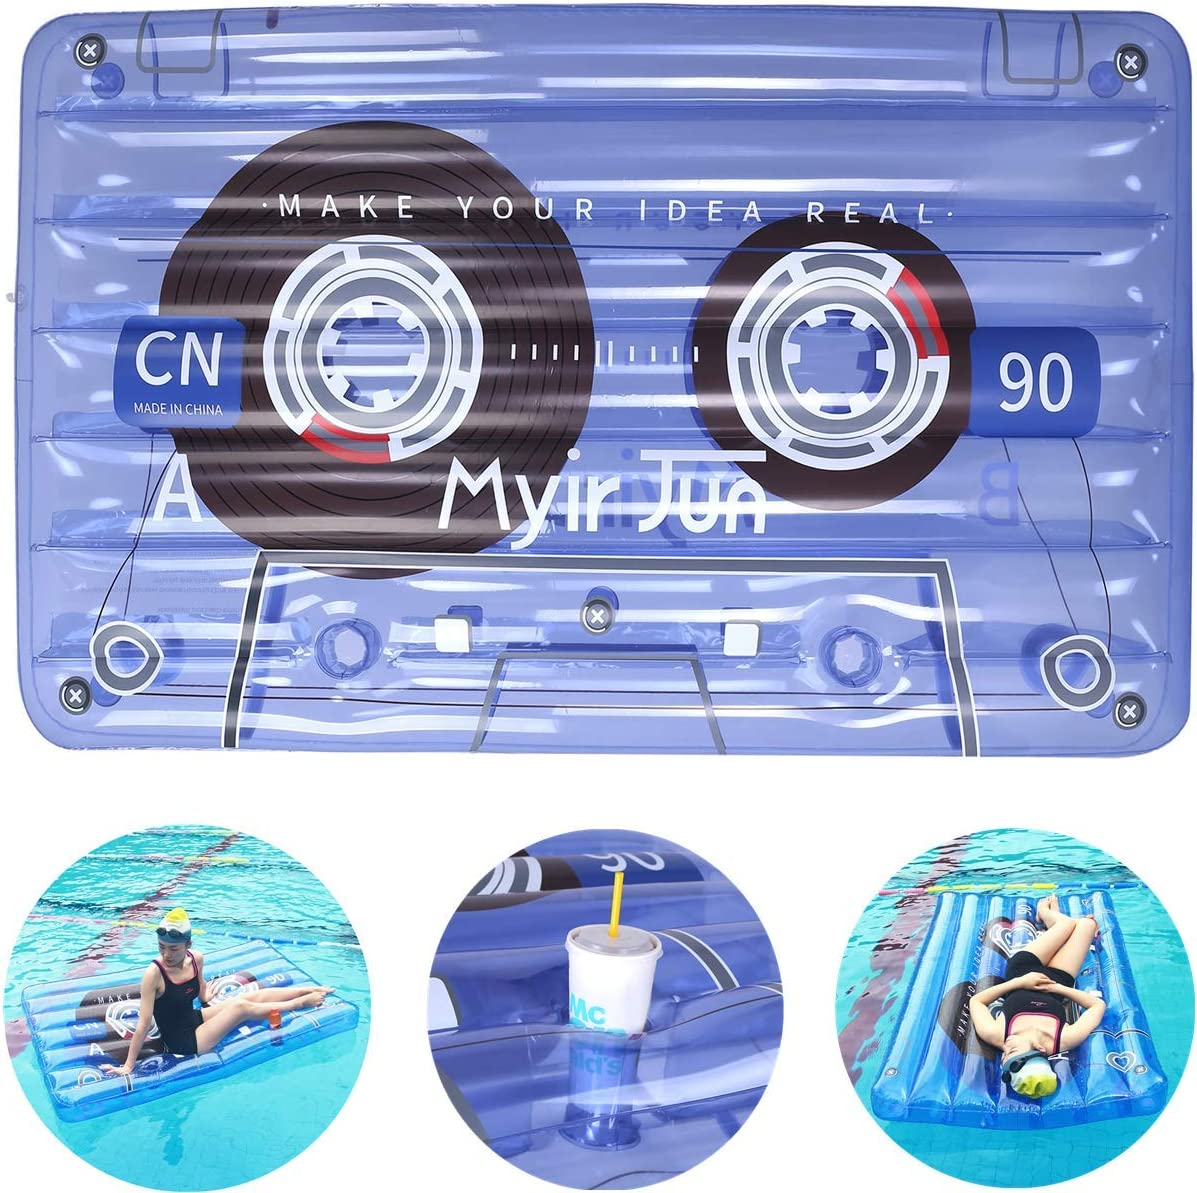 Myir Jun Cinta de Audio Hinchable Gigante con 2 Posavasos, Flotador Piscina Transparente Colchoneta Piscina Inflable para Piscina Flotador de Agua Adultos Niños (Cinta de Audio)